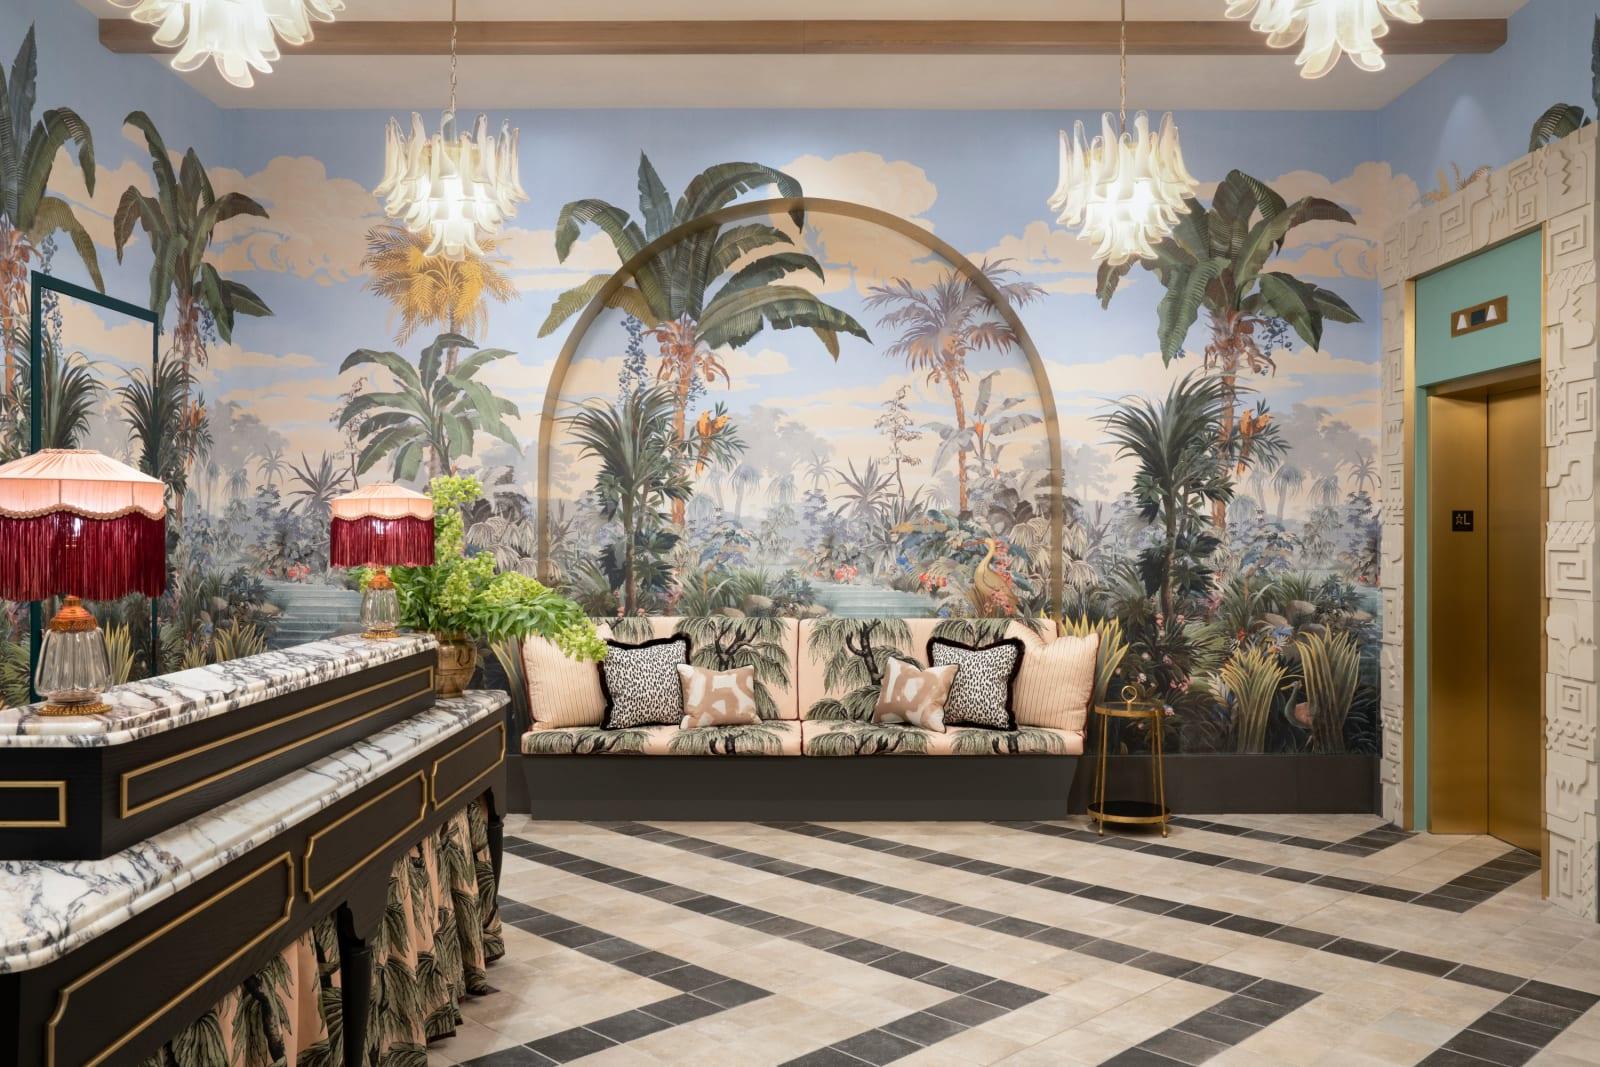 Goodtime Hotel in Miami